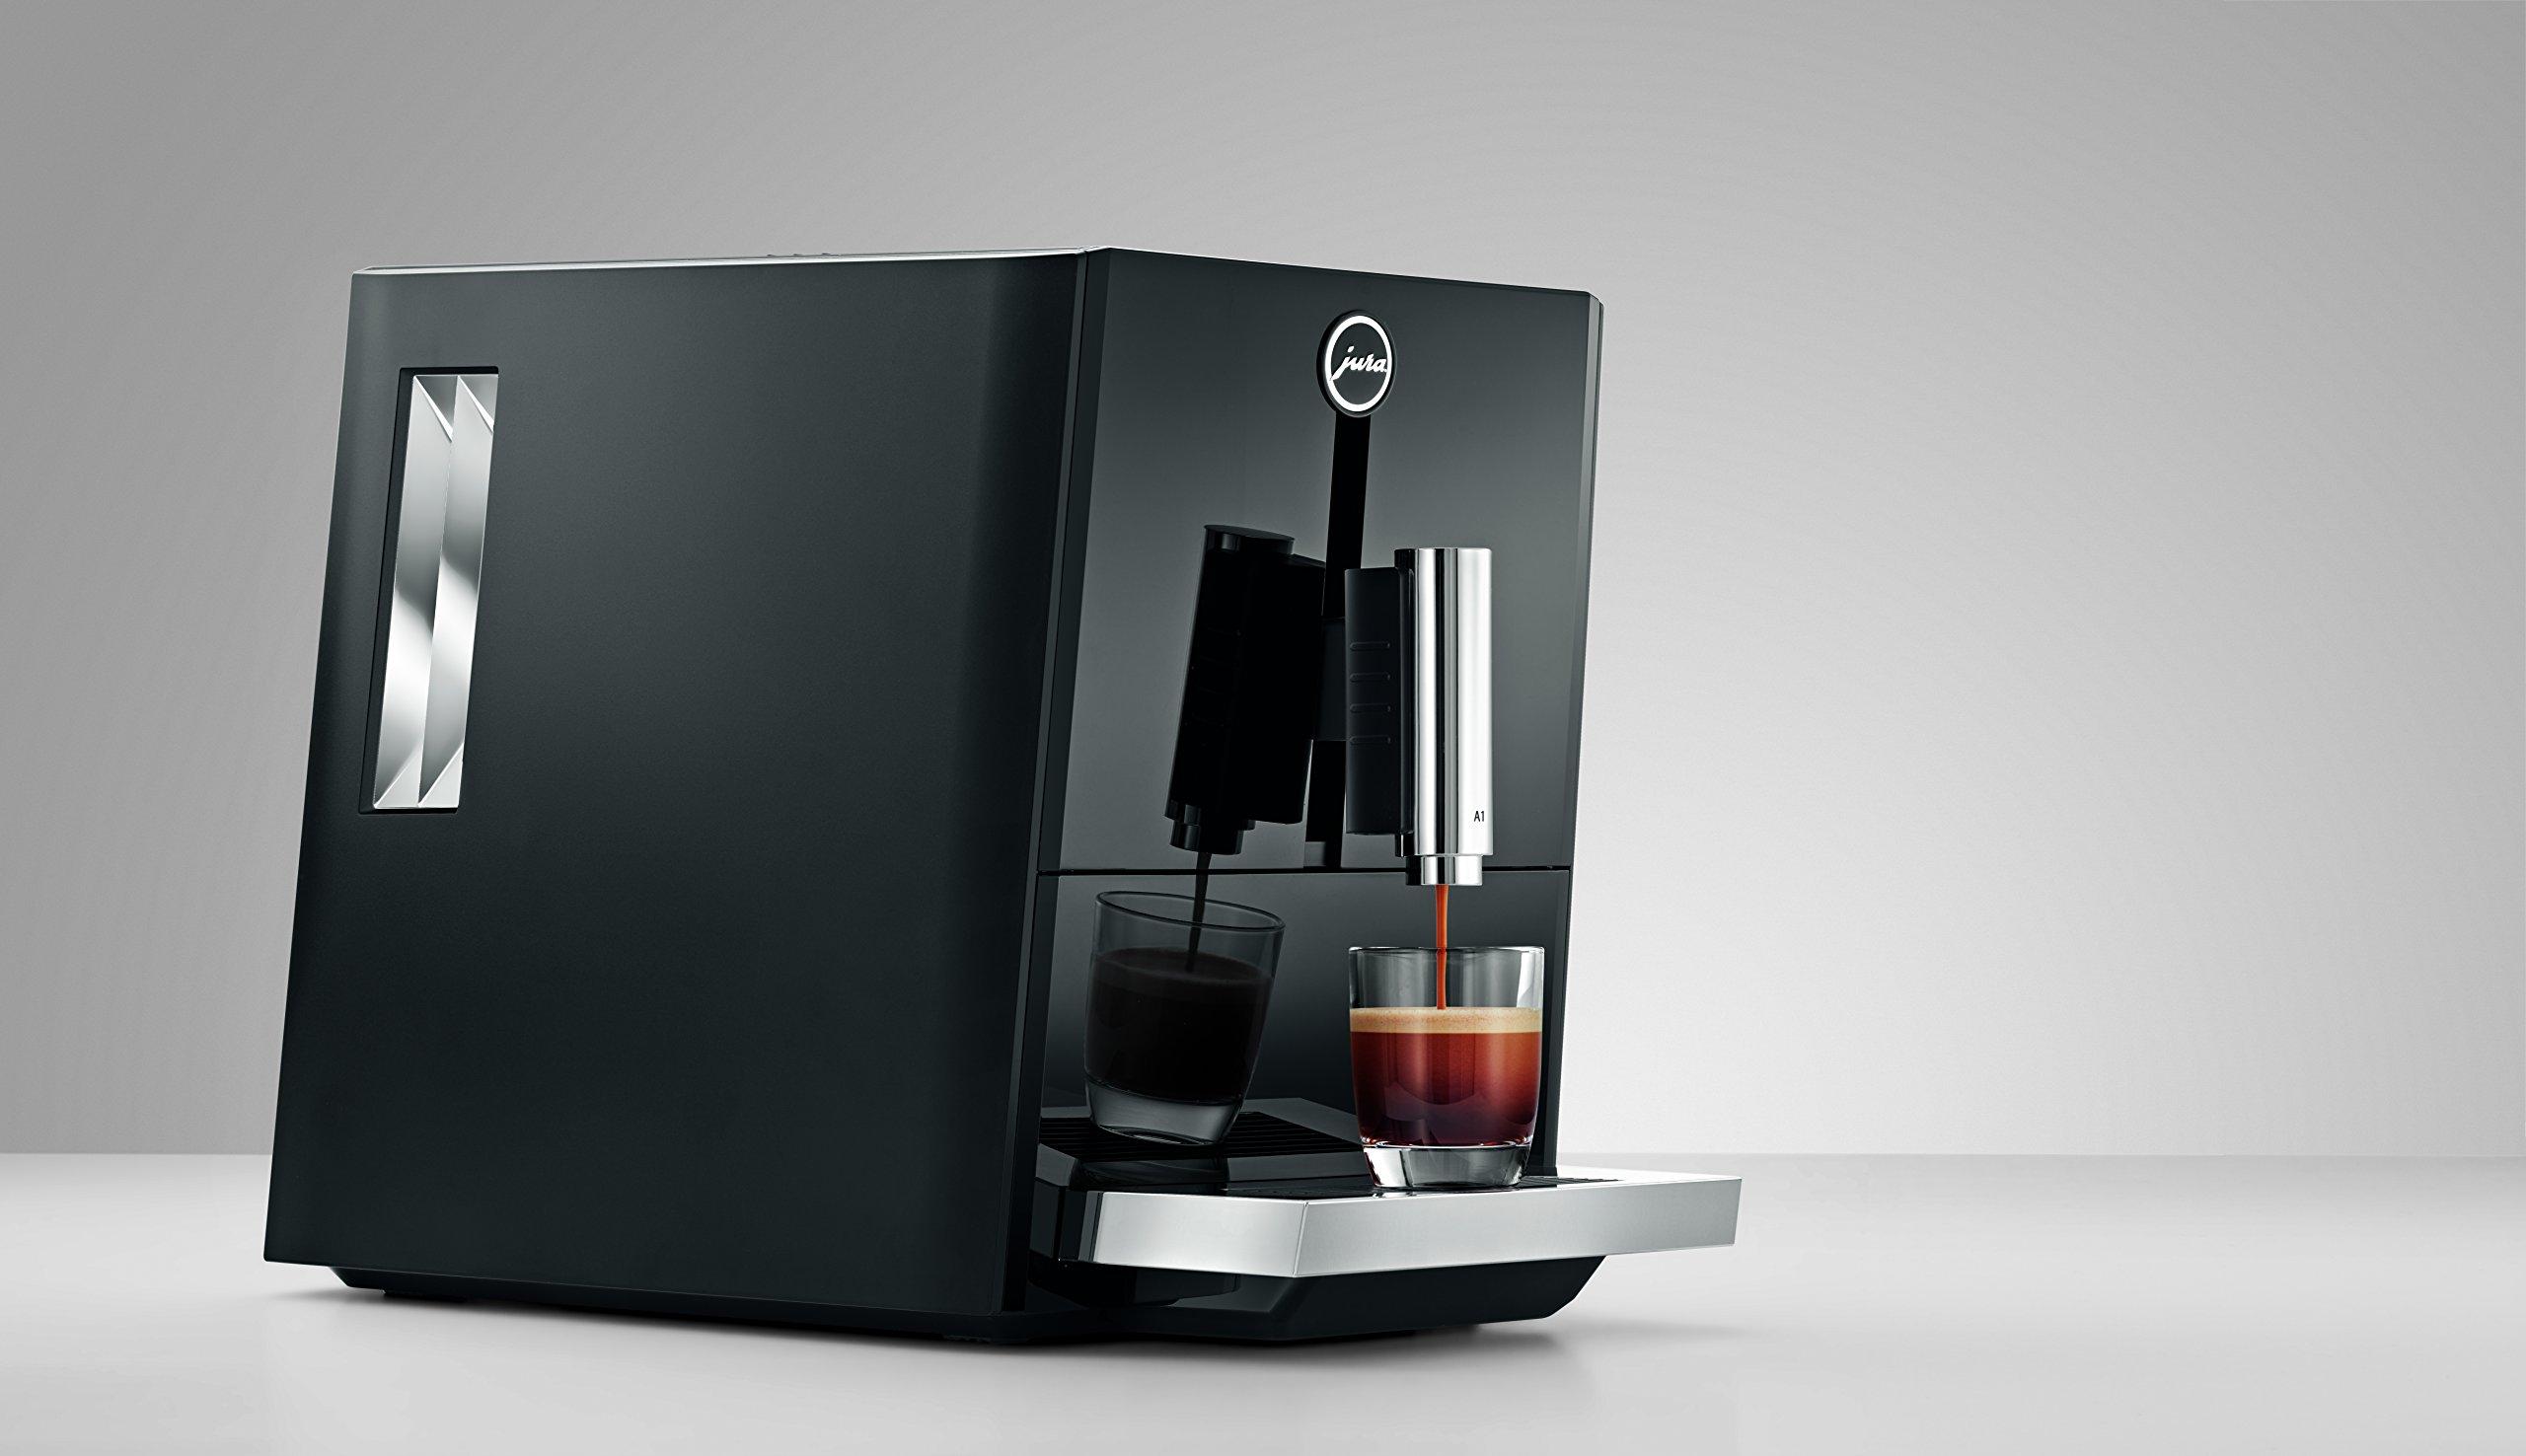 JURA-15133-A1-Coffee-Machine-1450-W-15-Bar-Piano-Black-Parent